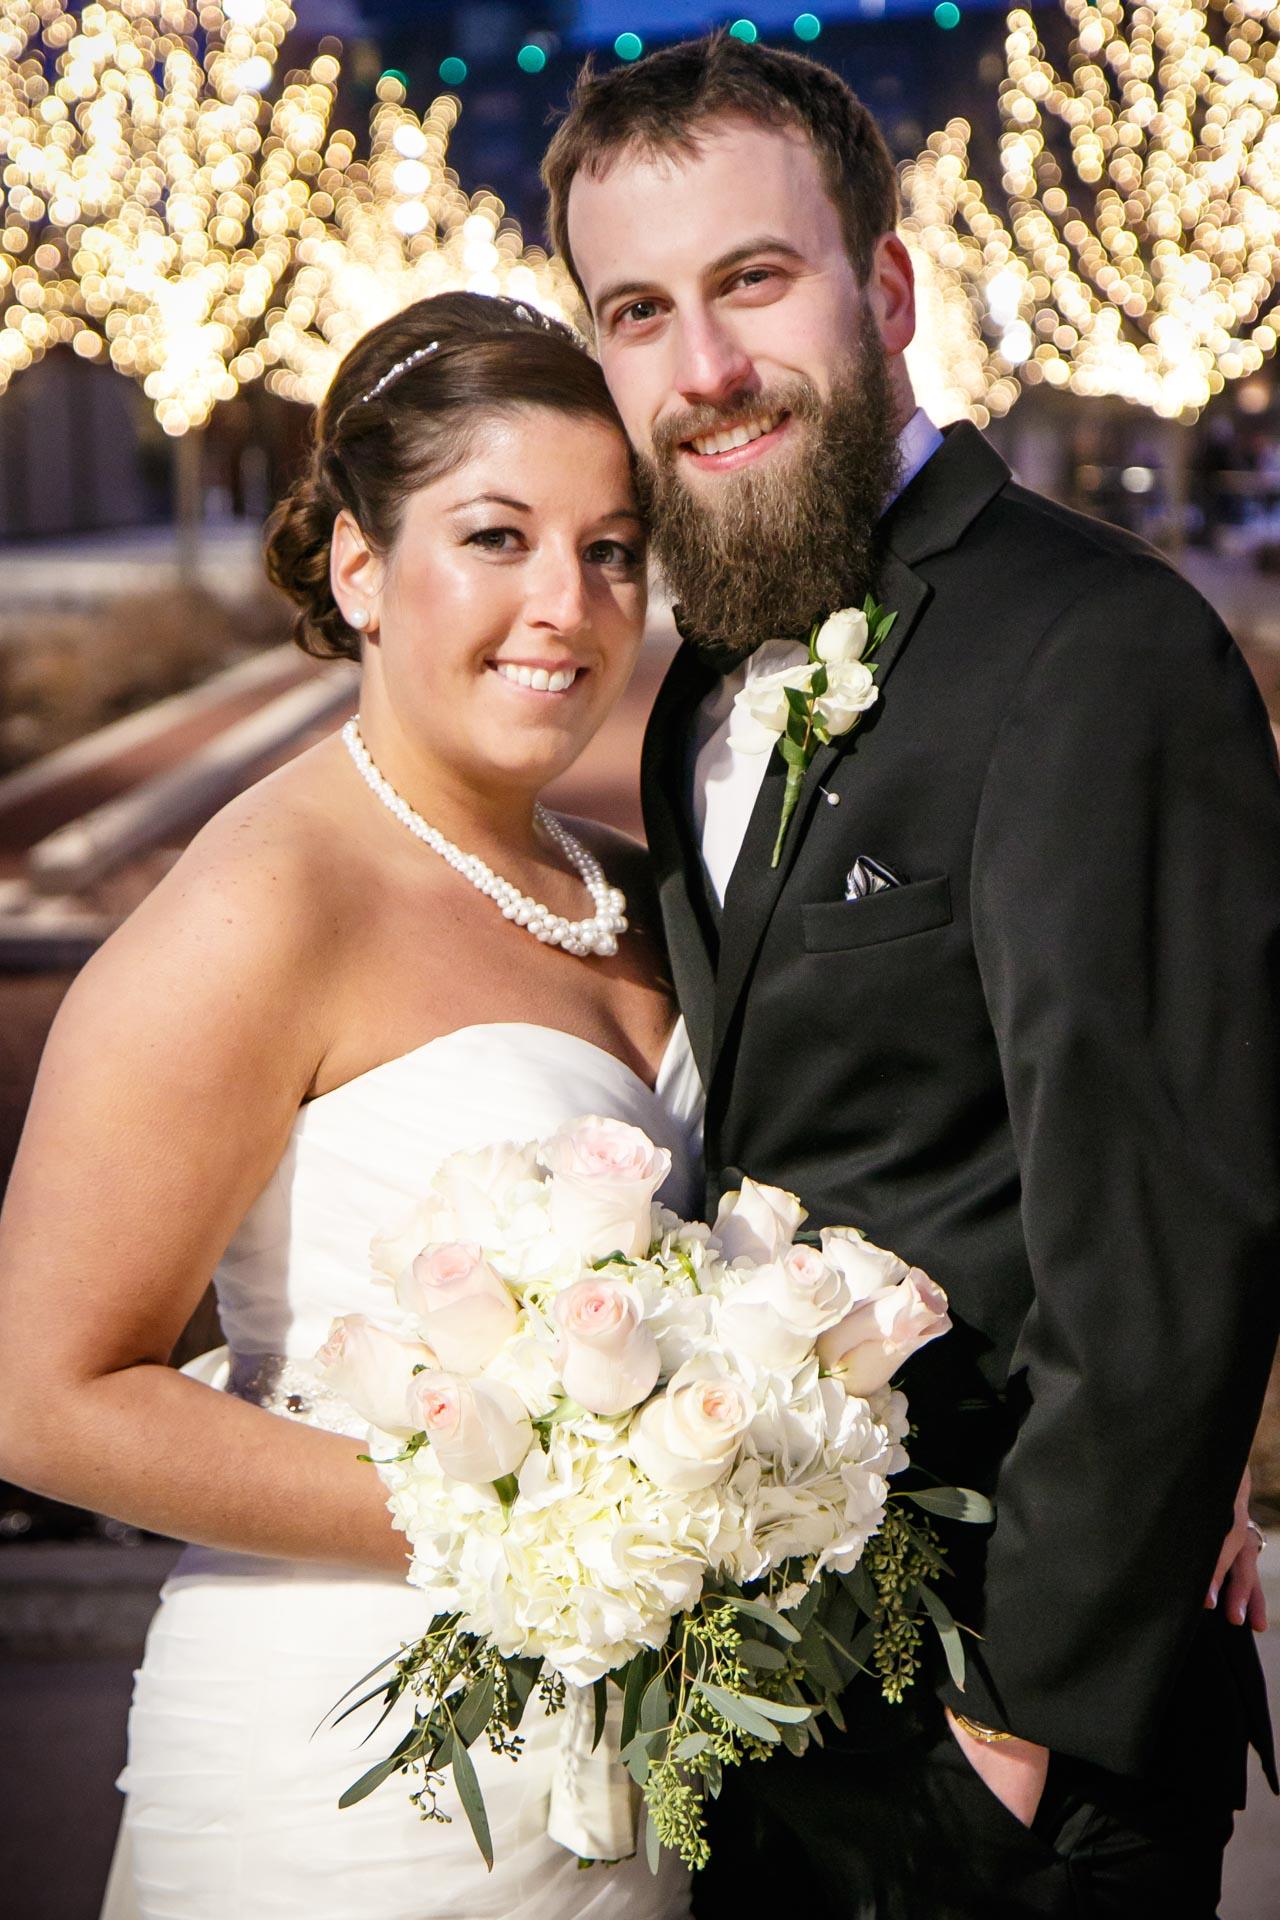 wedding-2-adam-shea-photography-green-bay-appleton-neenah-photographer-22.jpg